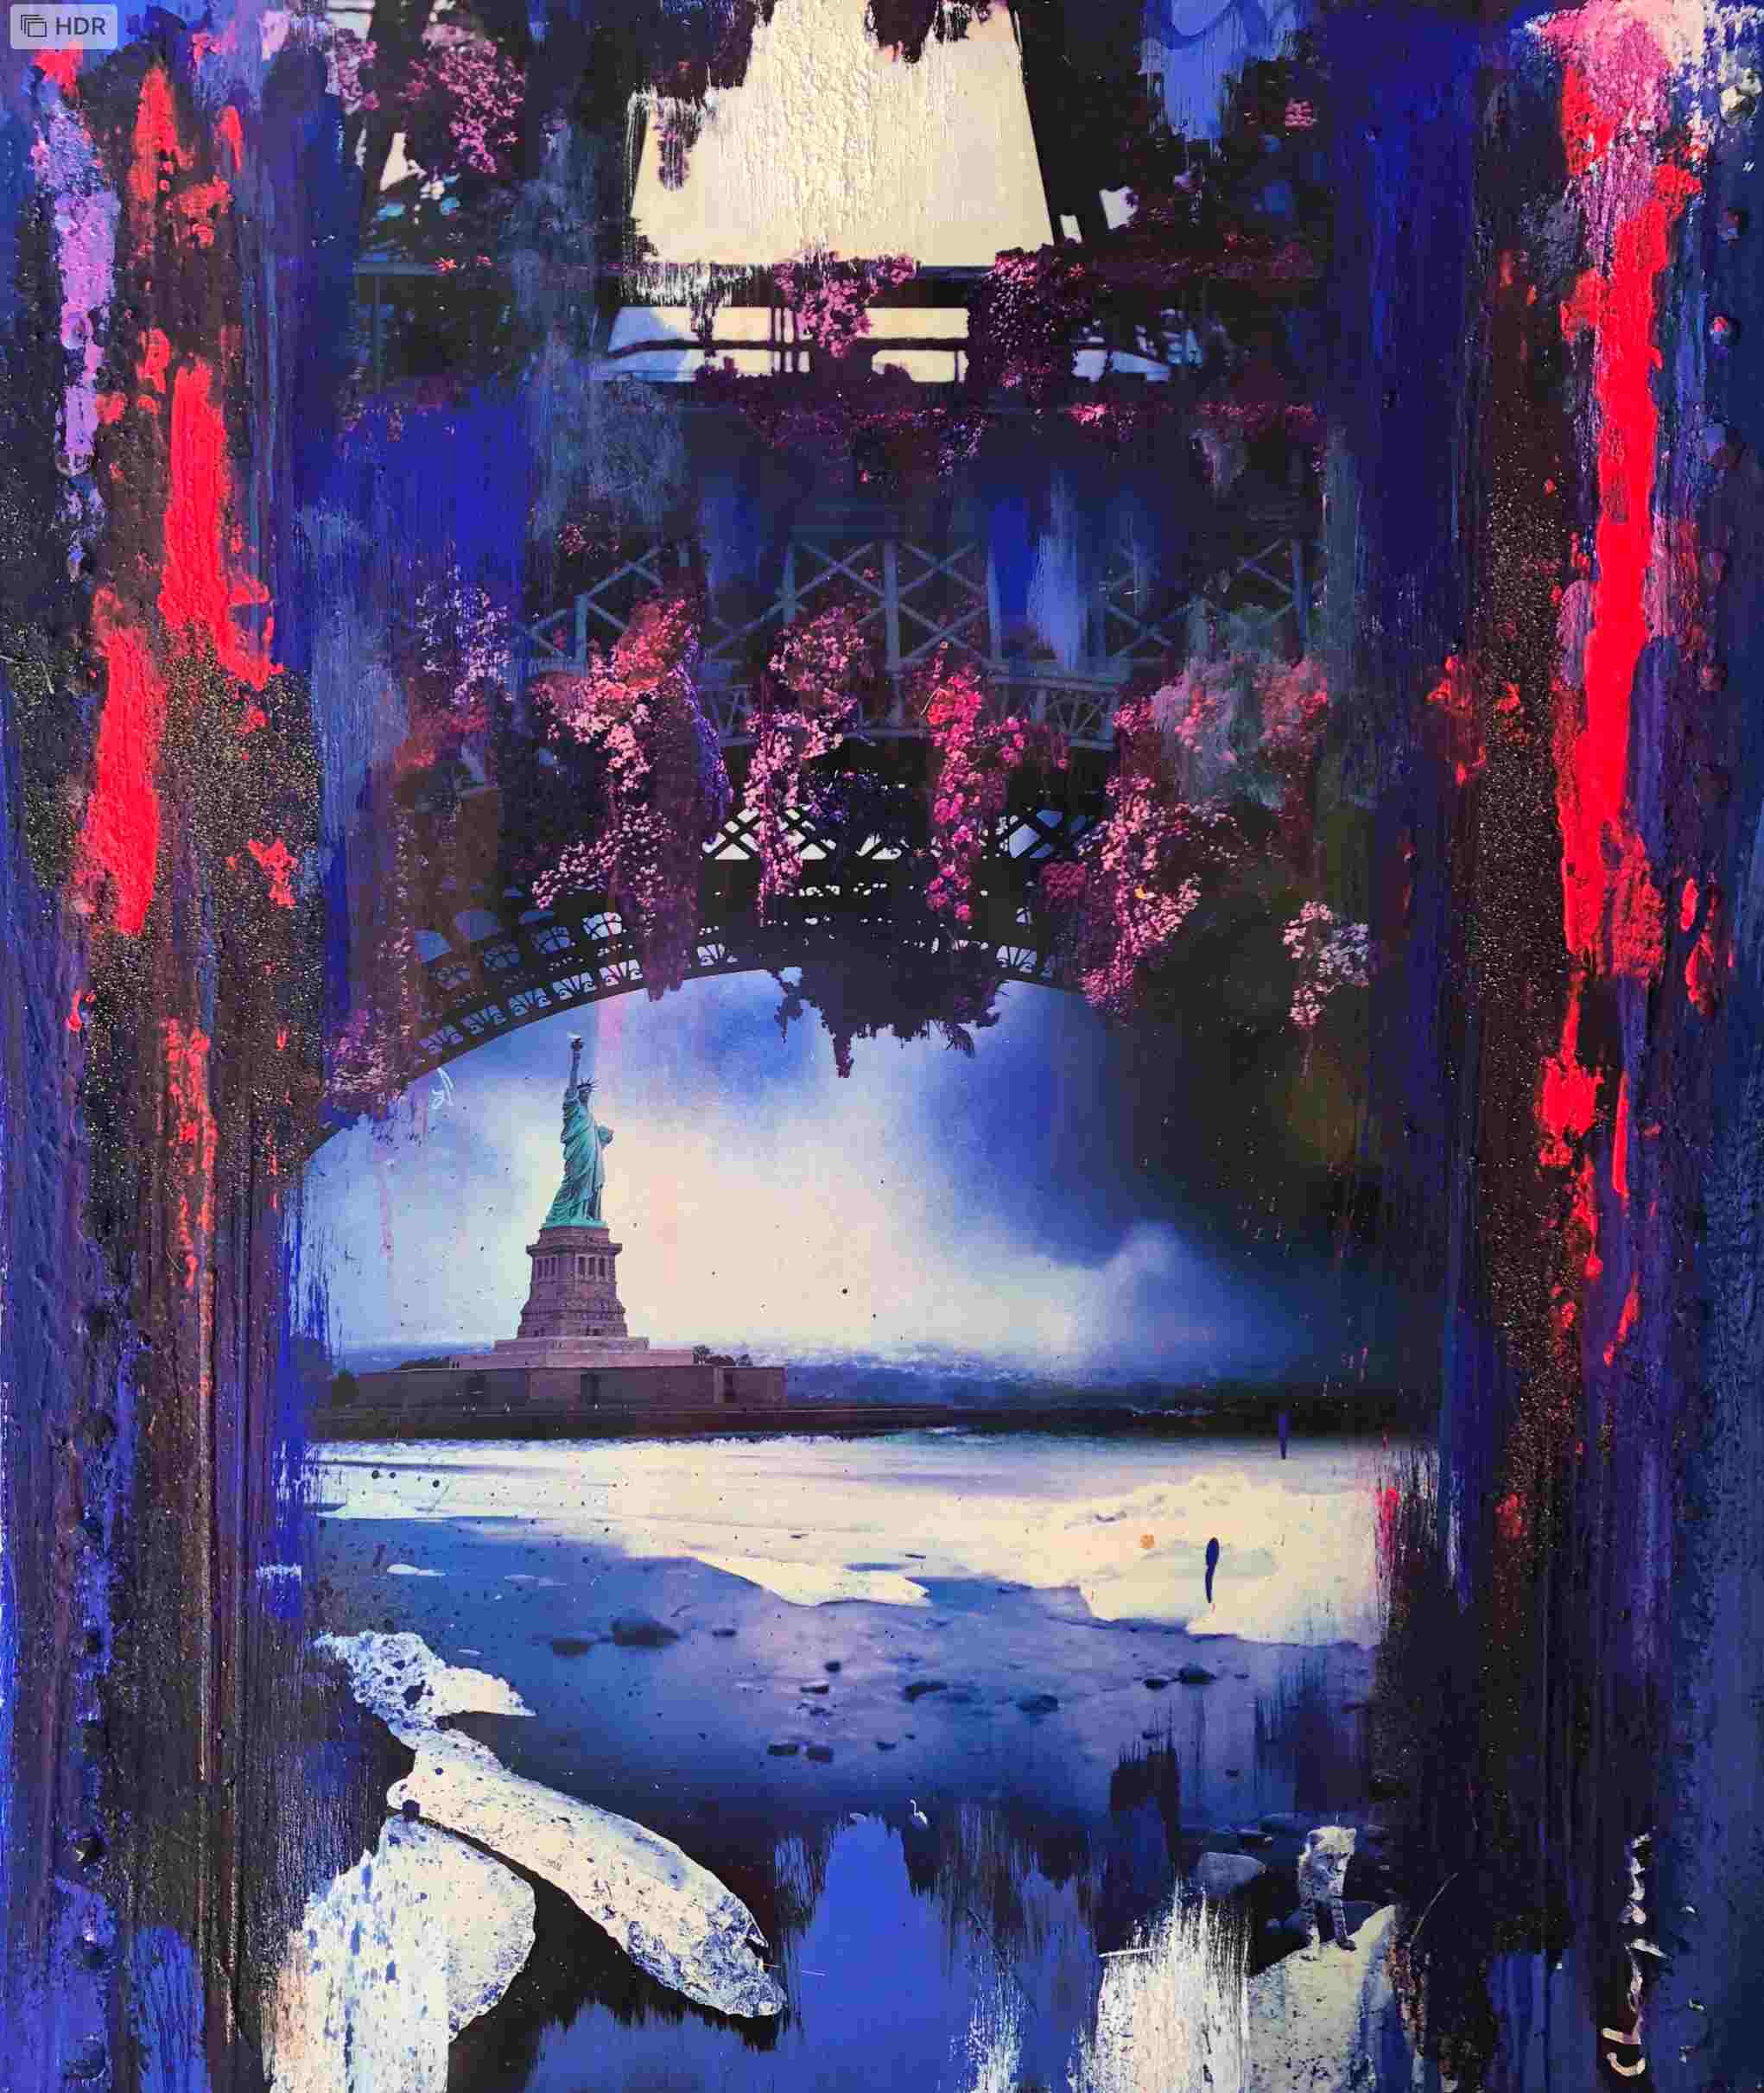 paris dream chayan khoi peintre artiste iranien